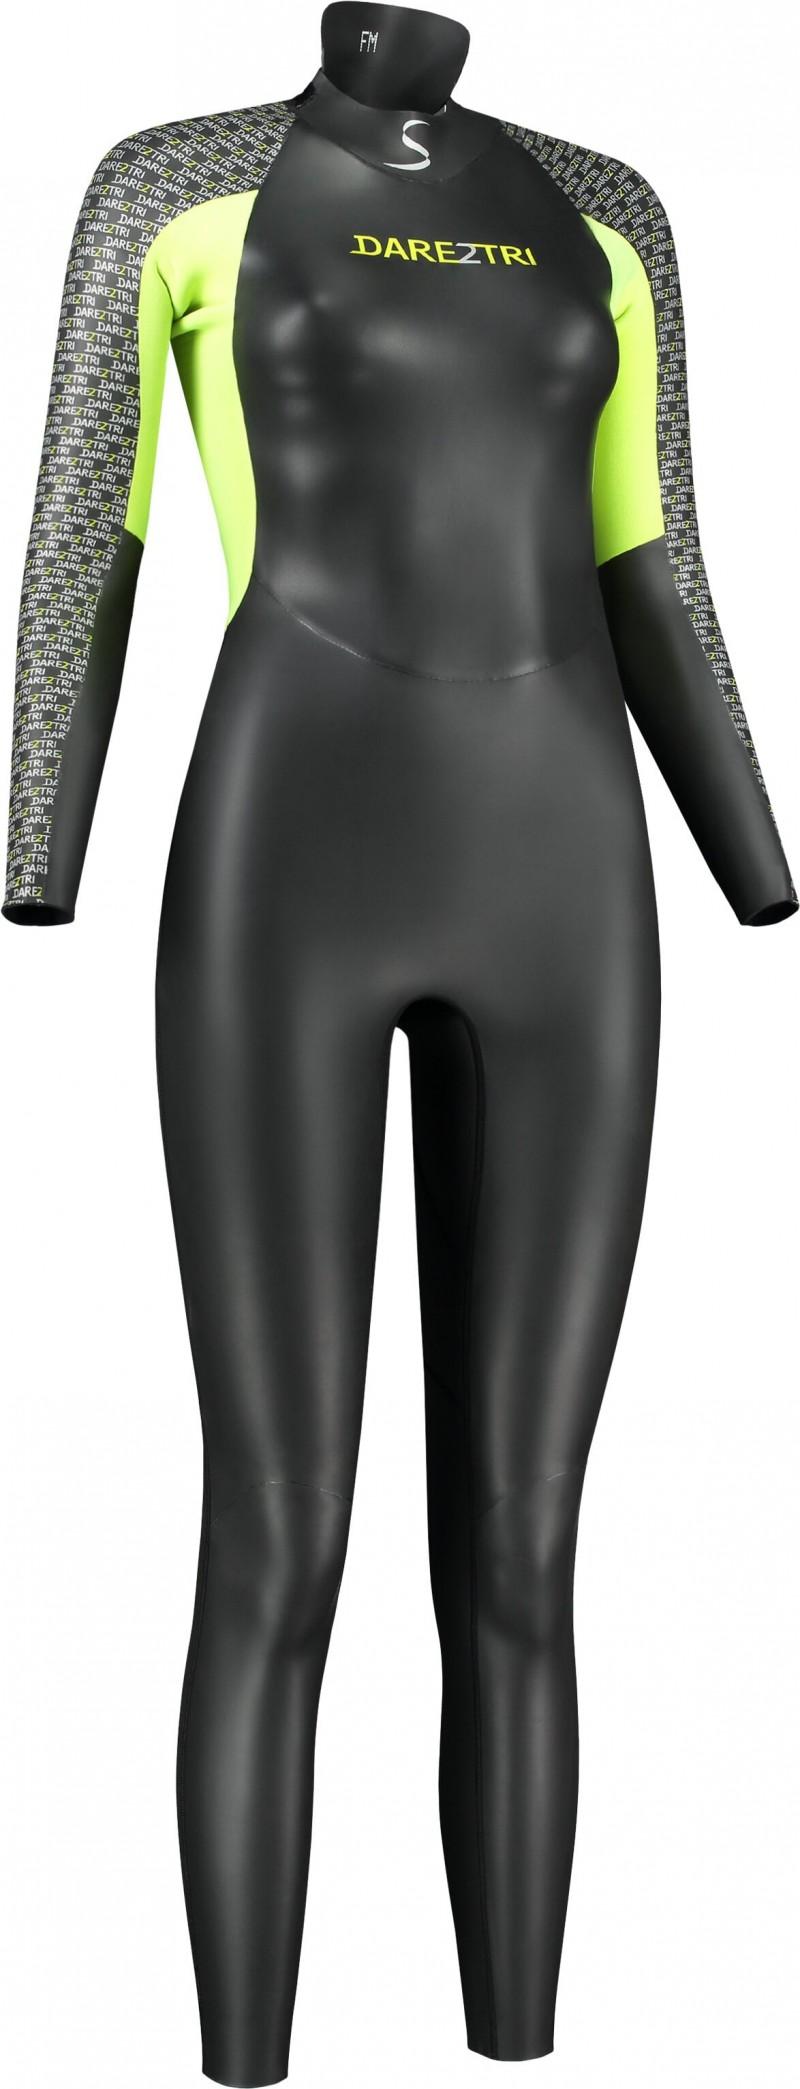 Dare2Tri - To Swim Wetsuit (Size: FM)